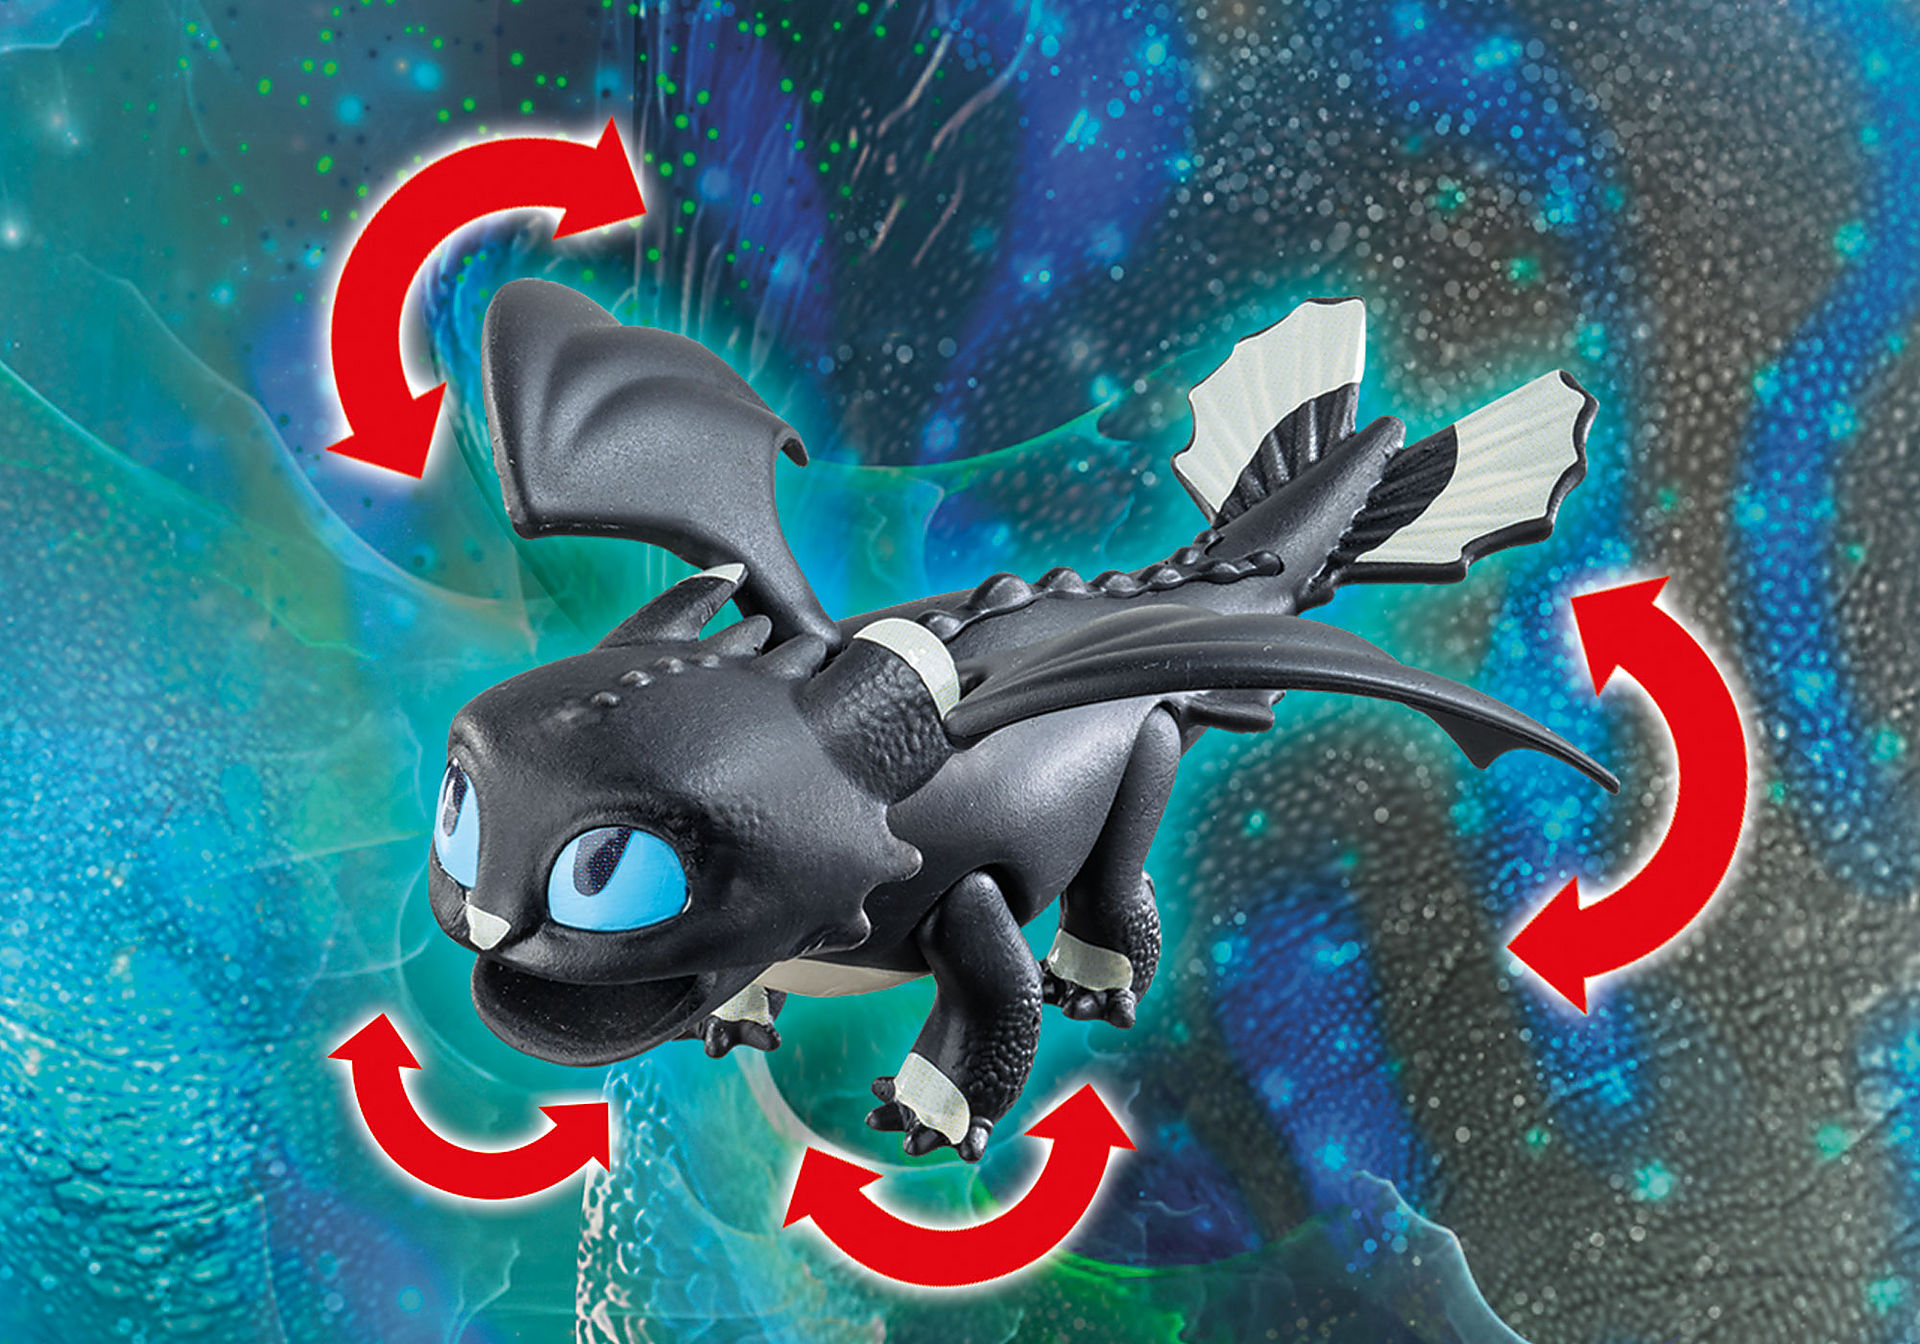 http://media.playmobil.com/i/playmobil/70457_product_extra1/Dragones bebé con niños